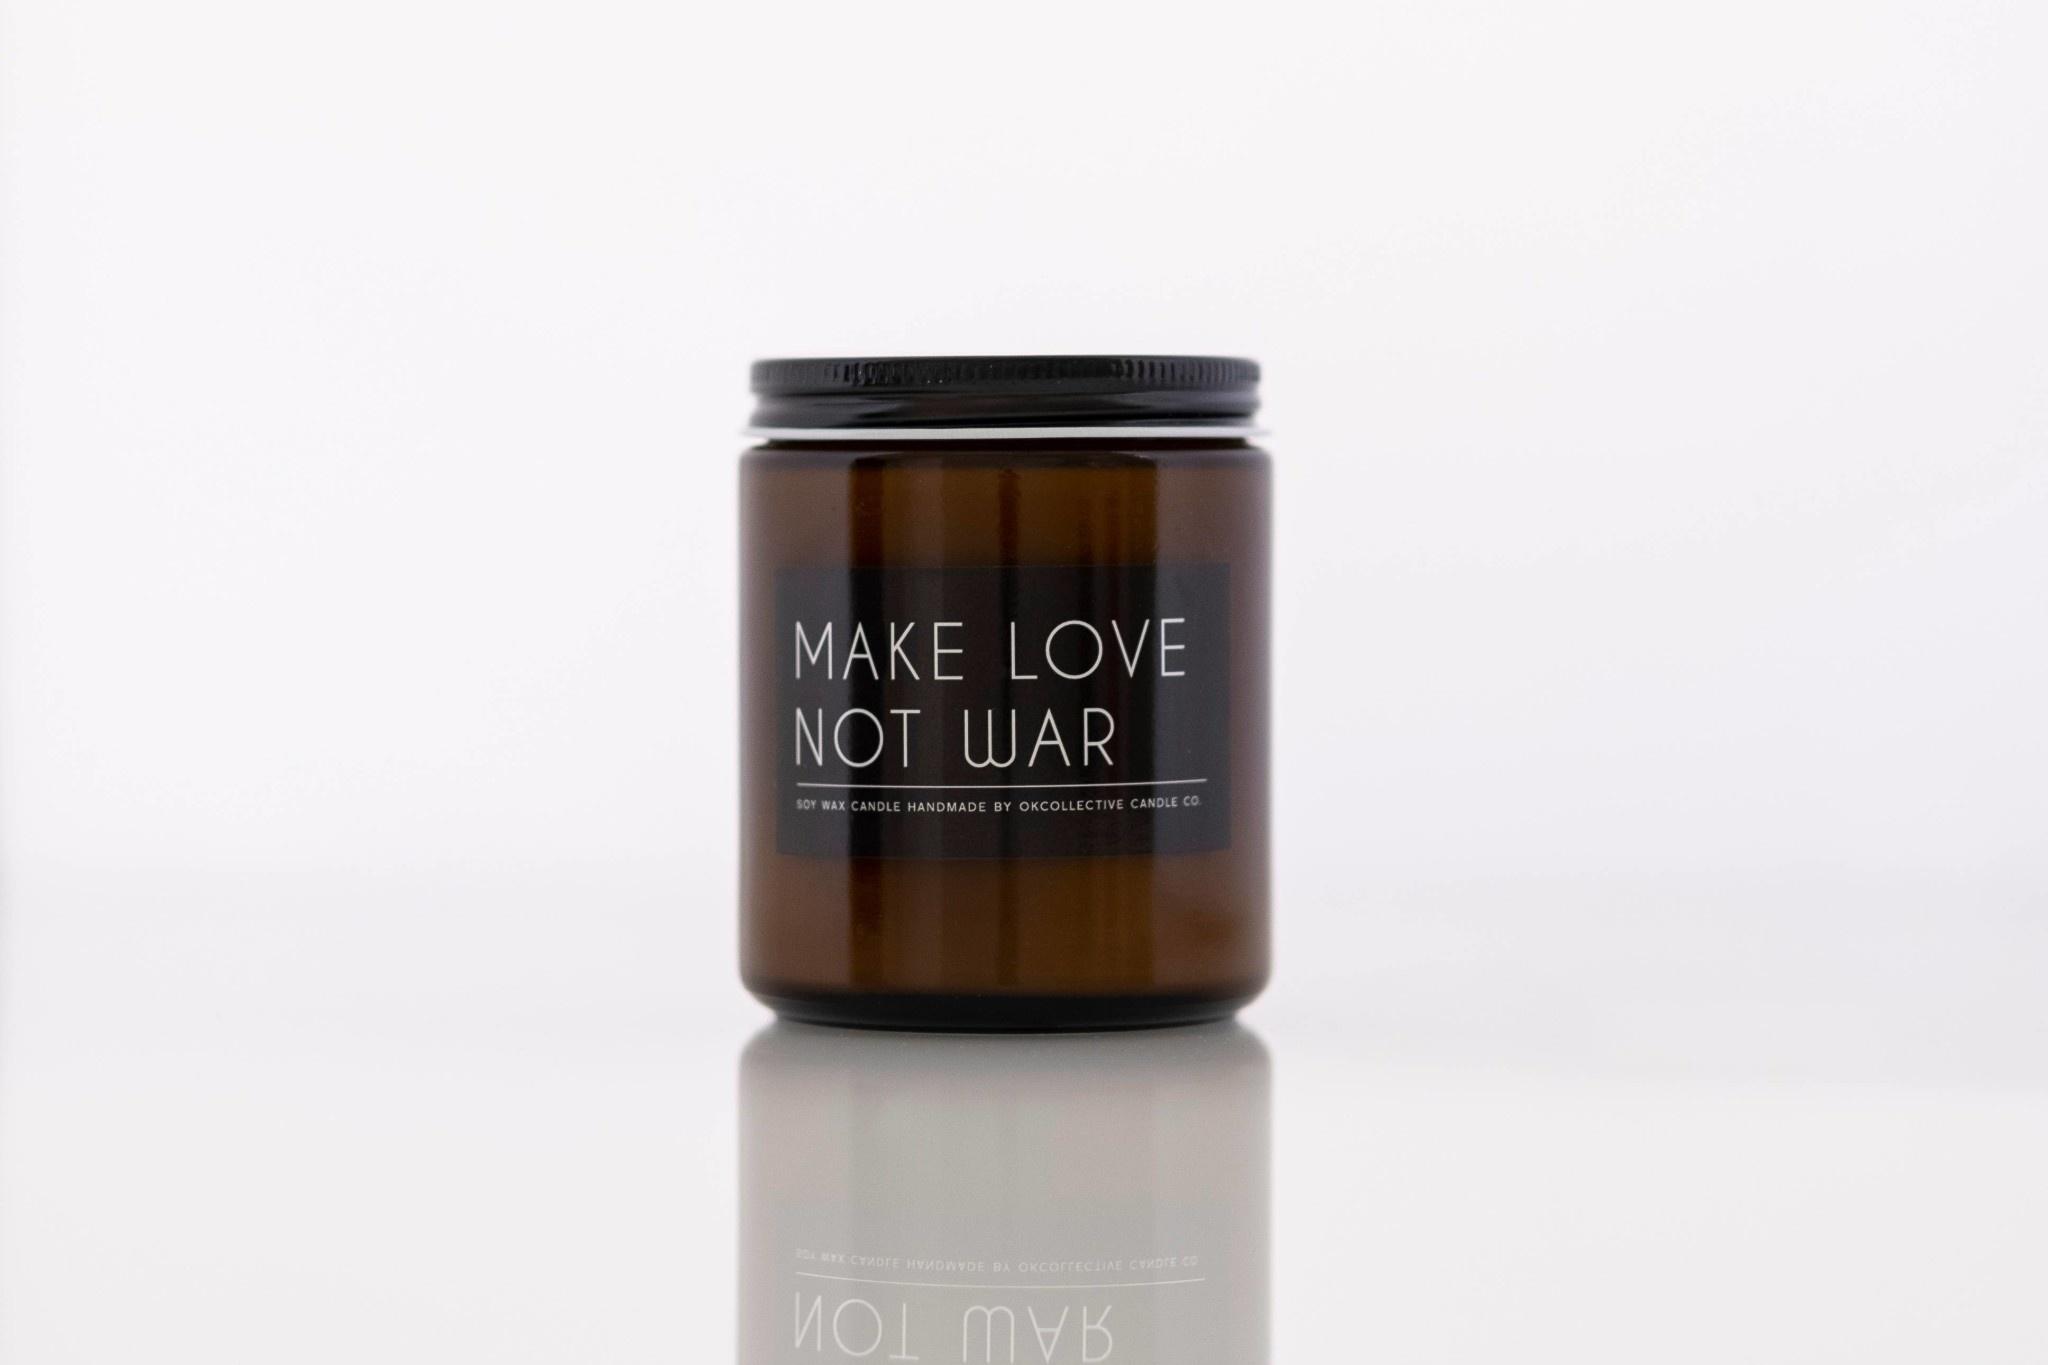 Make Love Not War 8oz Candle